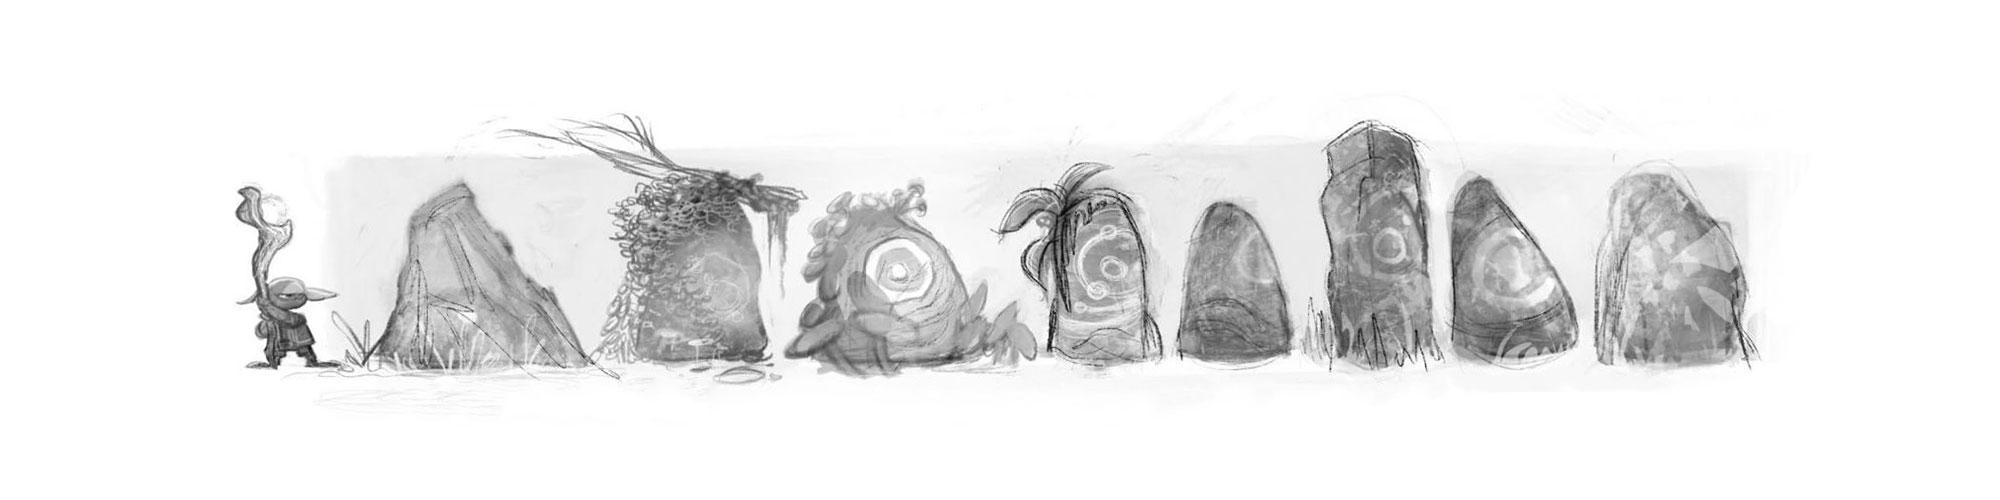 Goblin-w-Ruins-v1.jpg